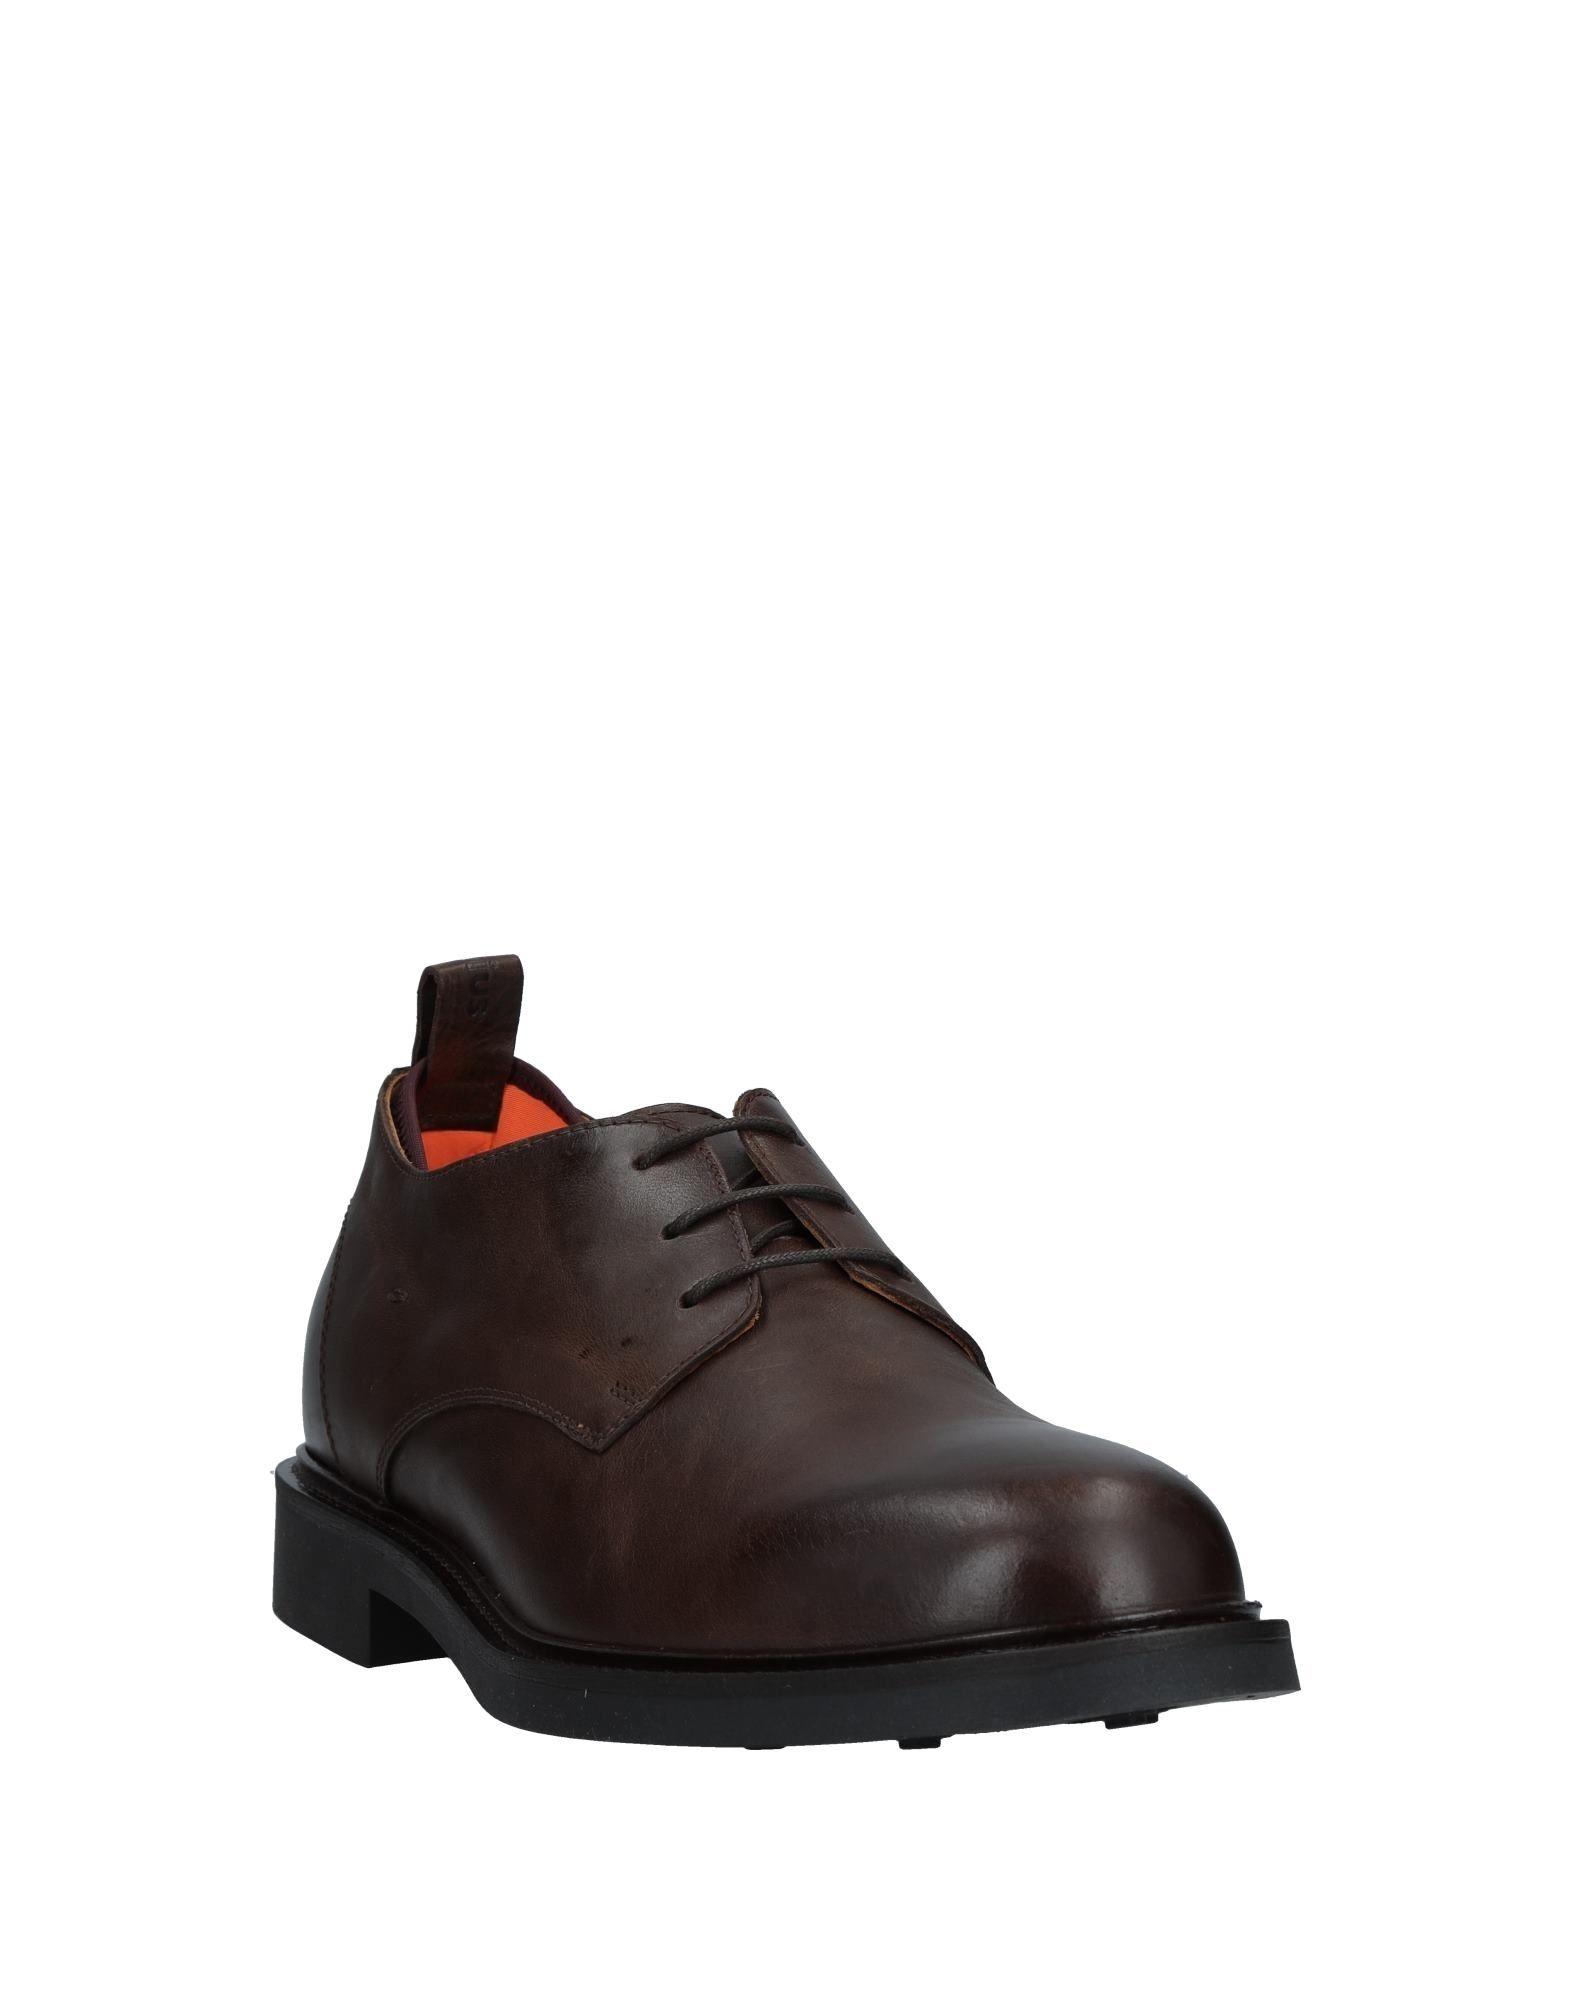 Rabatt echte Schuhe Levius  Schnürschuhe Herren  Levius 11529683CD 1d3f91